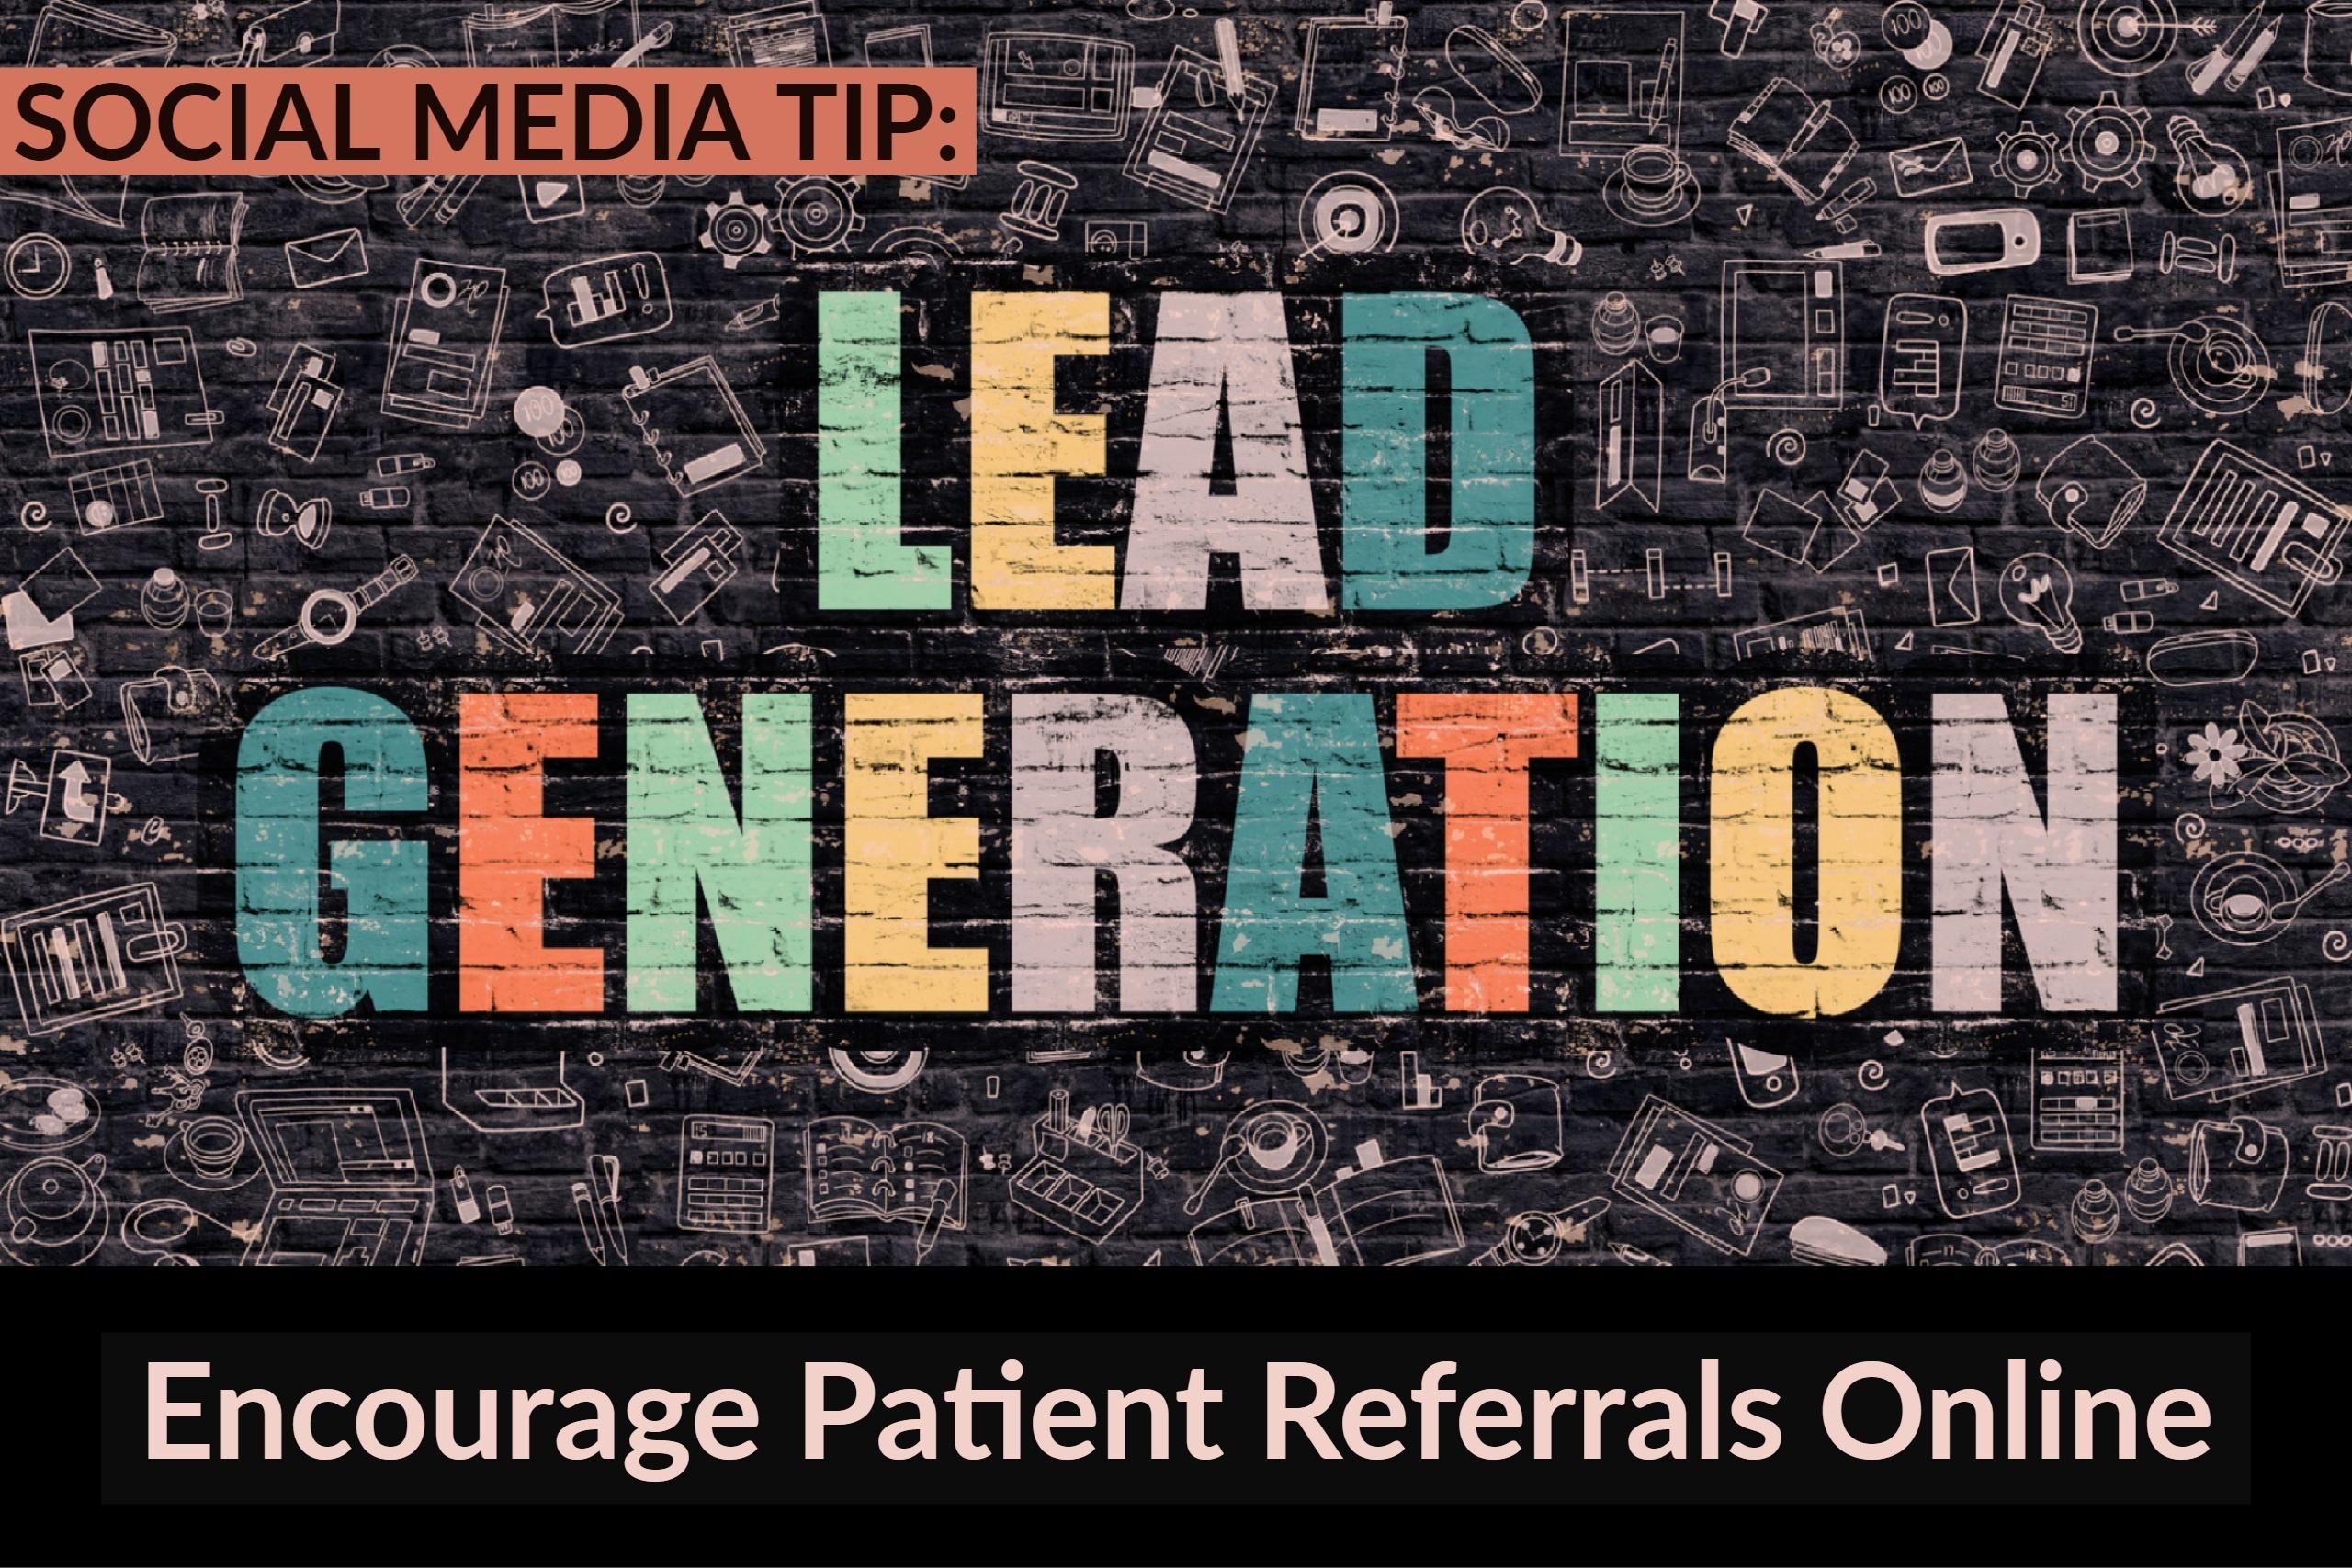 4.9 Social Media Tip_ Encourage Patient Referrals Online